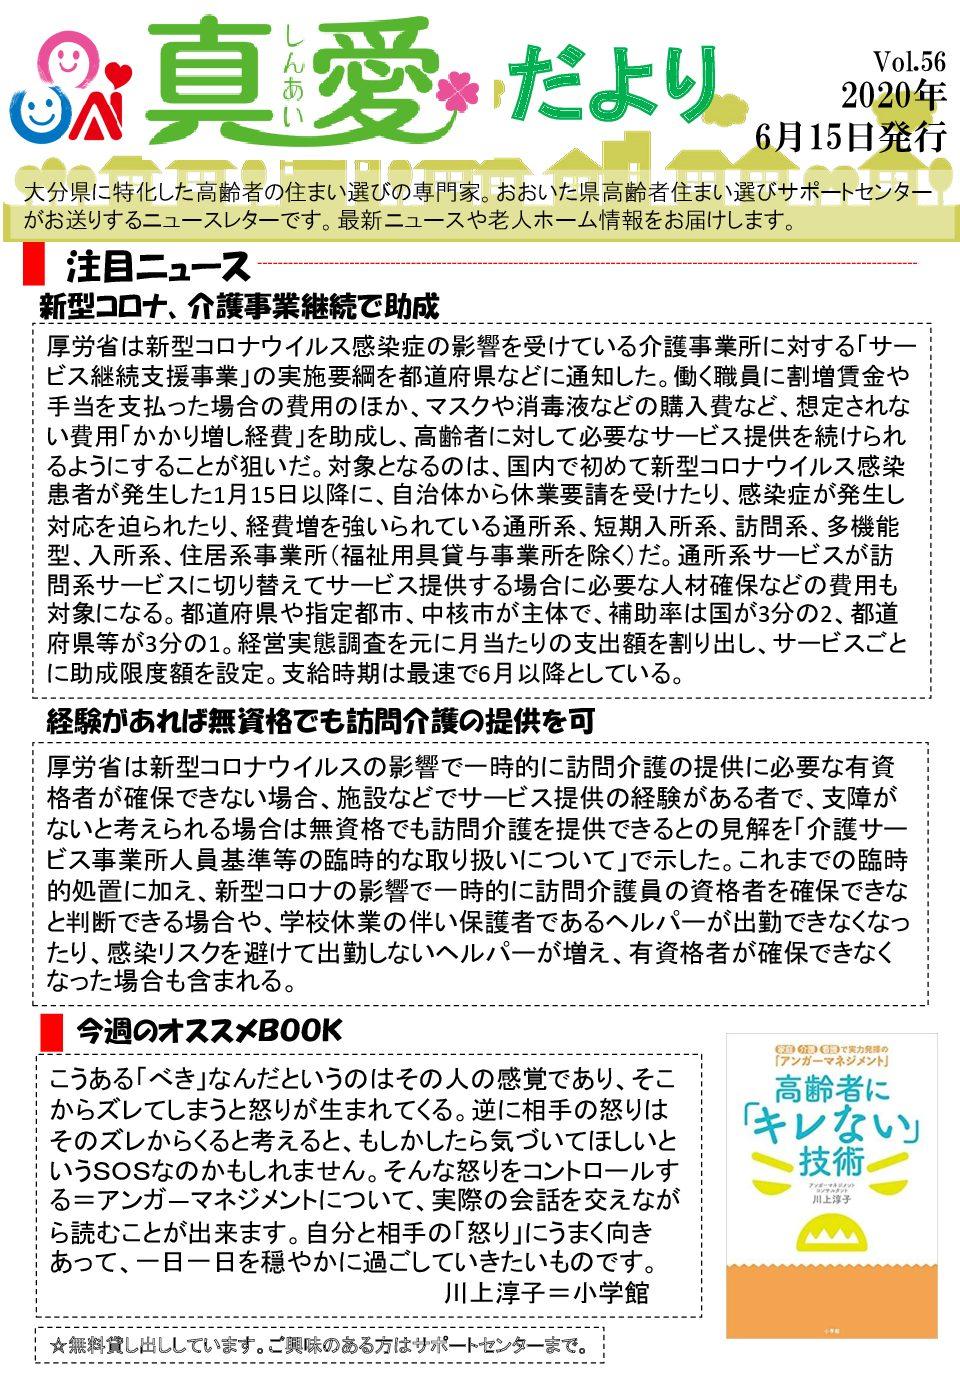 【Vol.56】 2020.06.15発行